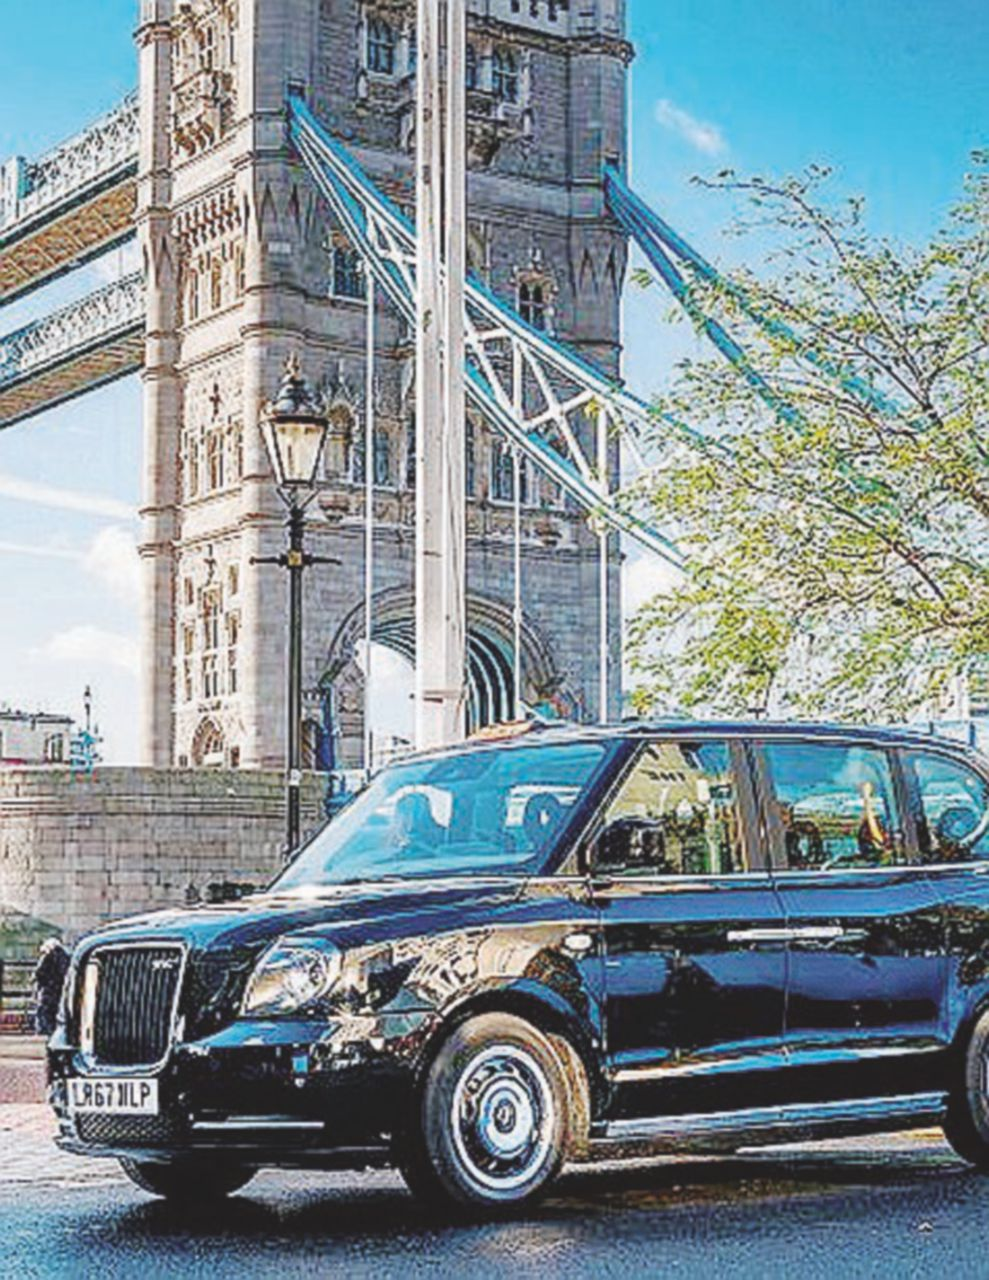 Sorpresa di Natale: a Londra i taxi diventano elettrici